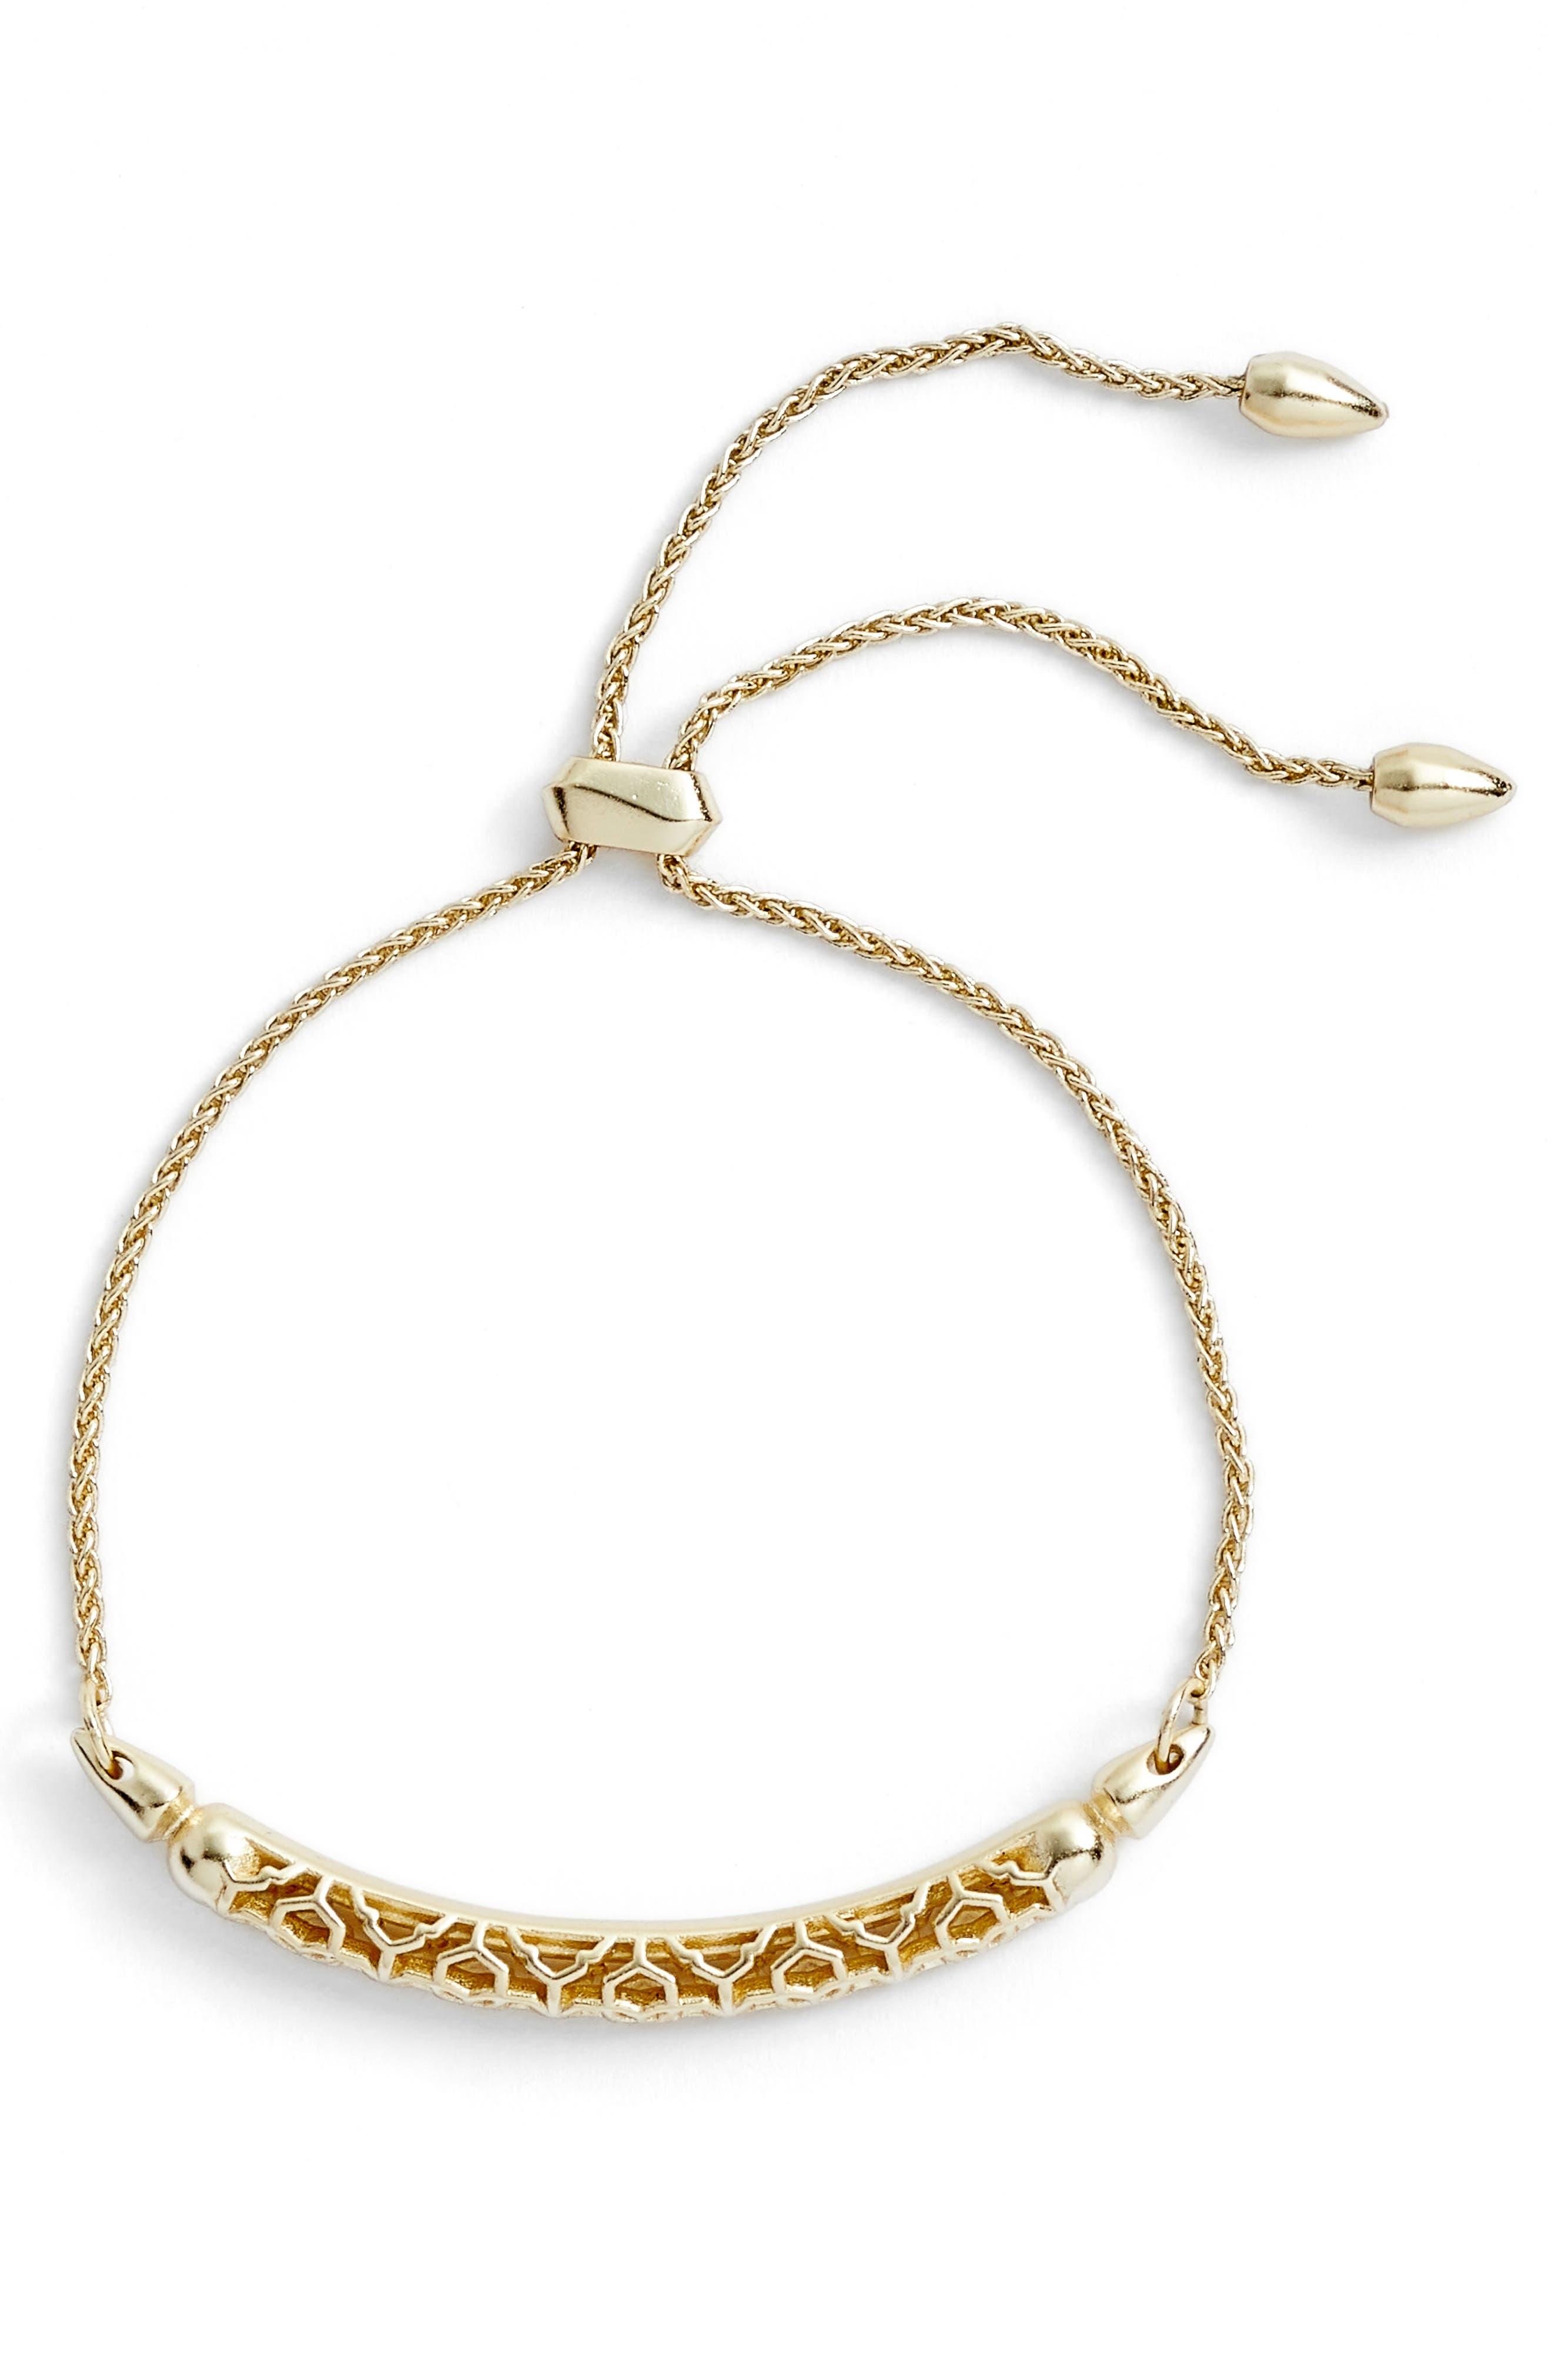 Gilly Adjustable Bracelet,                             Main thumbnail 1, color,                             Gold Filigree